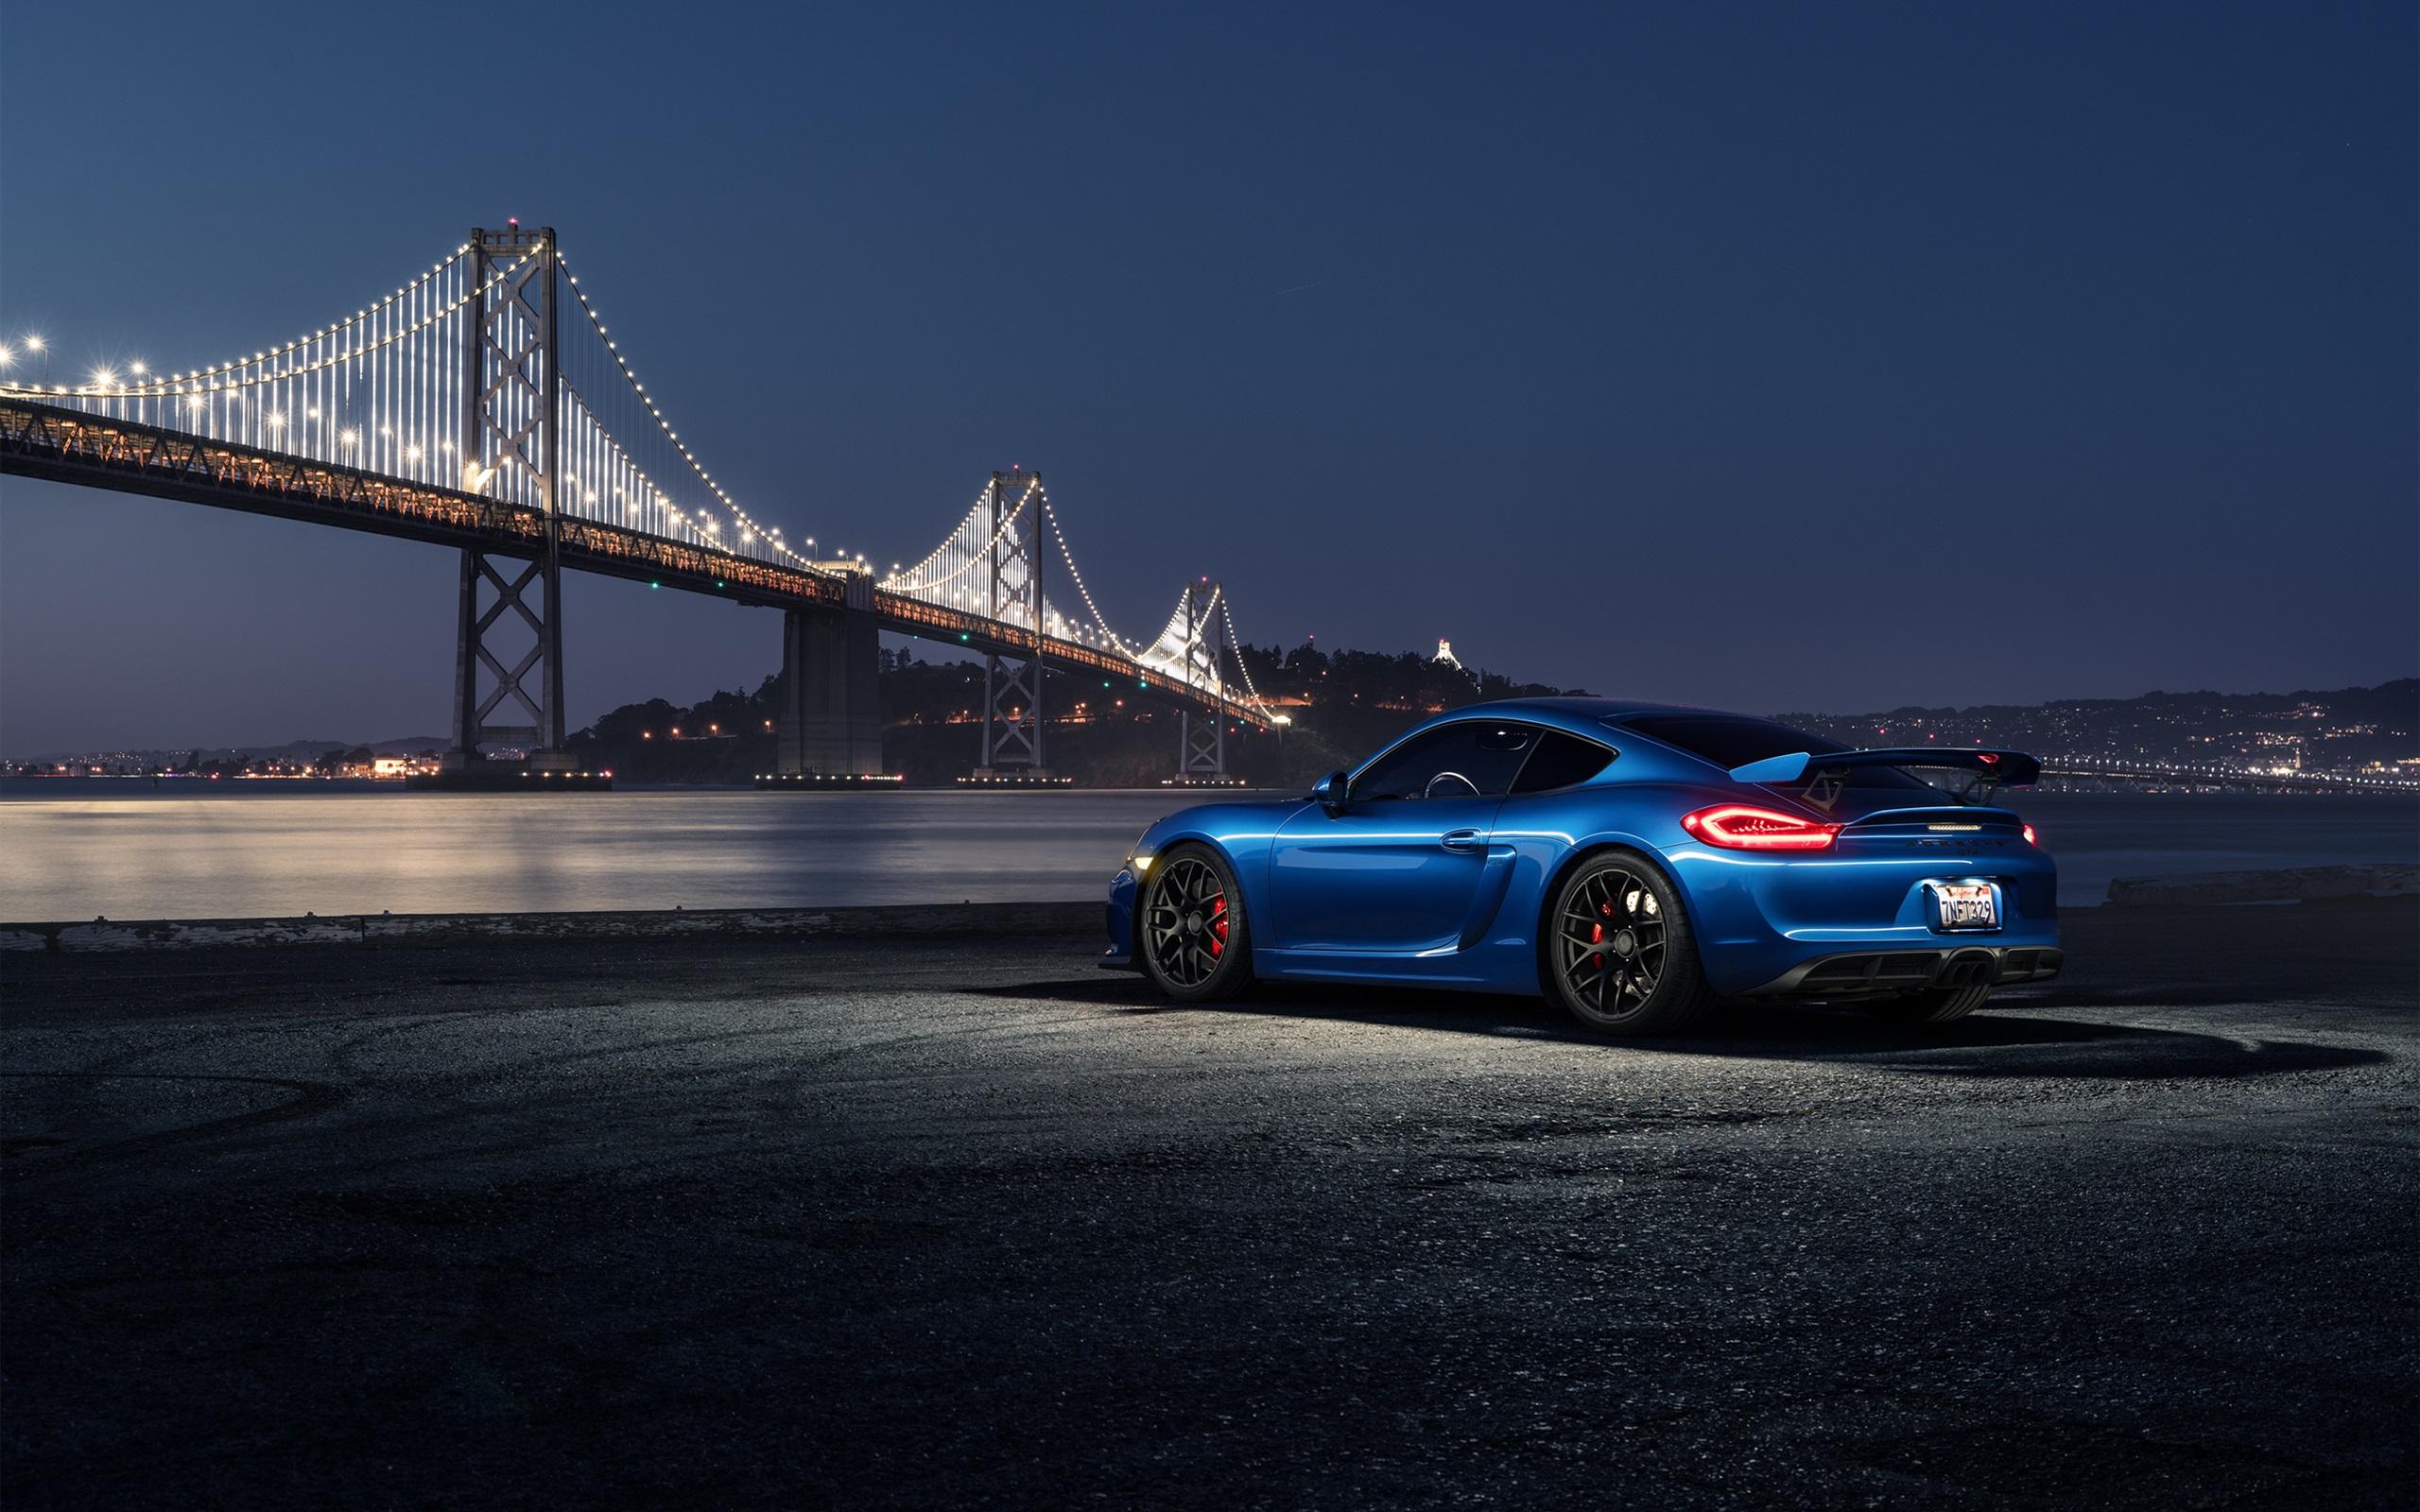 Wallpaper Porsche Cayman Gt4 Blue Car At Night 2560x1600 Hd Picture Image